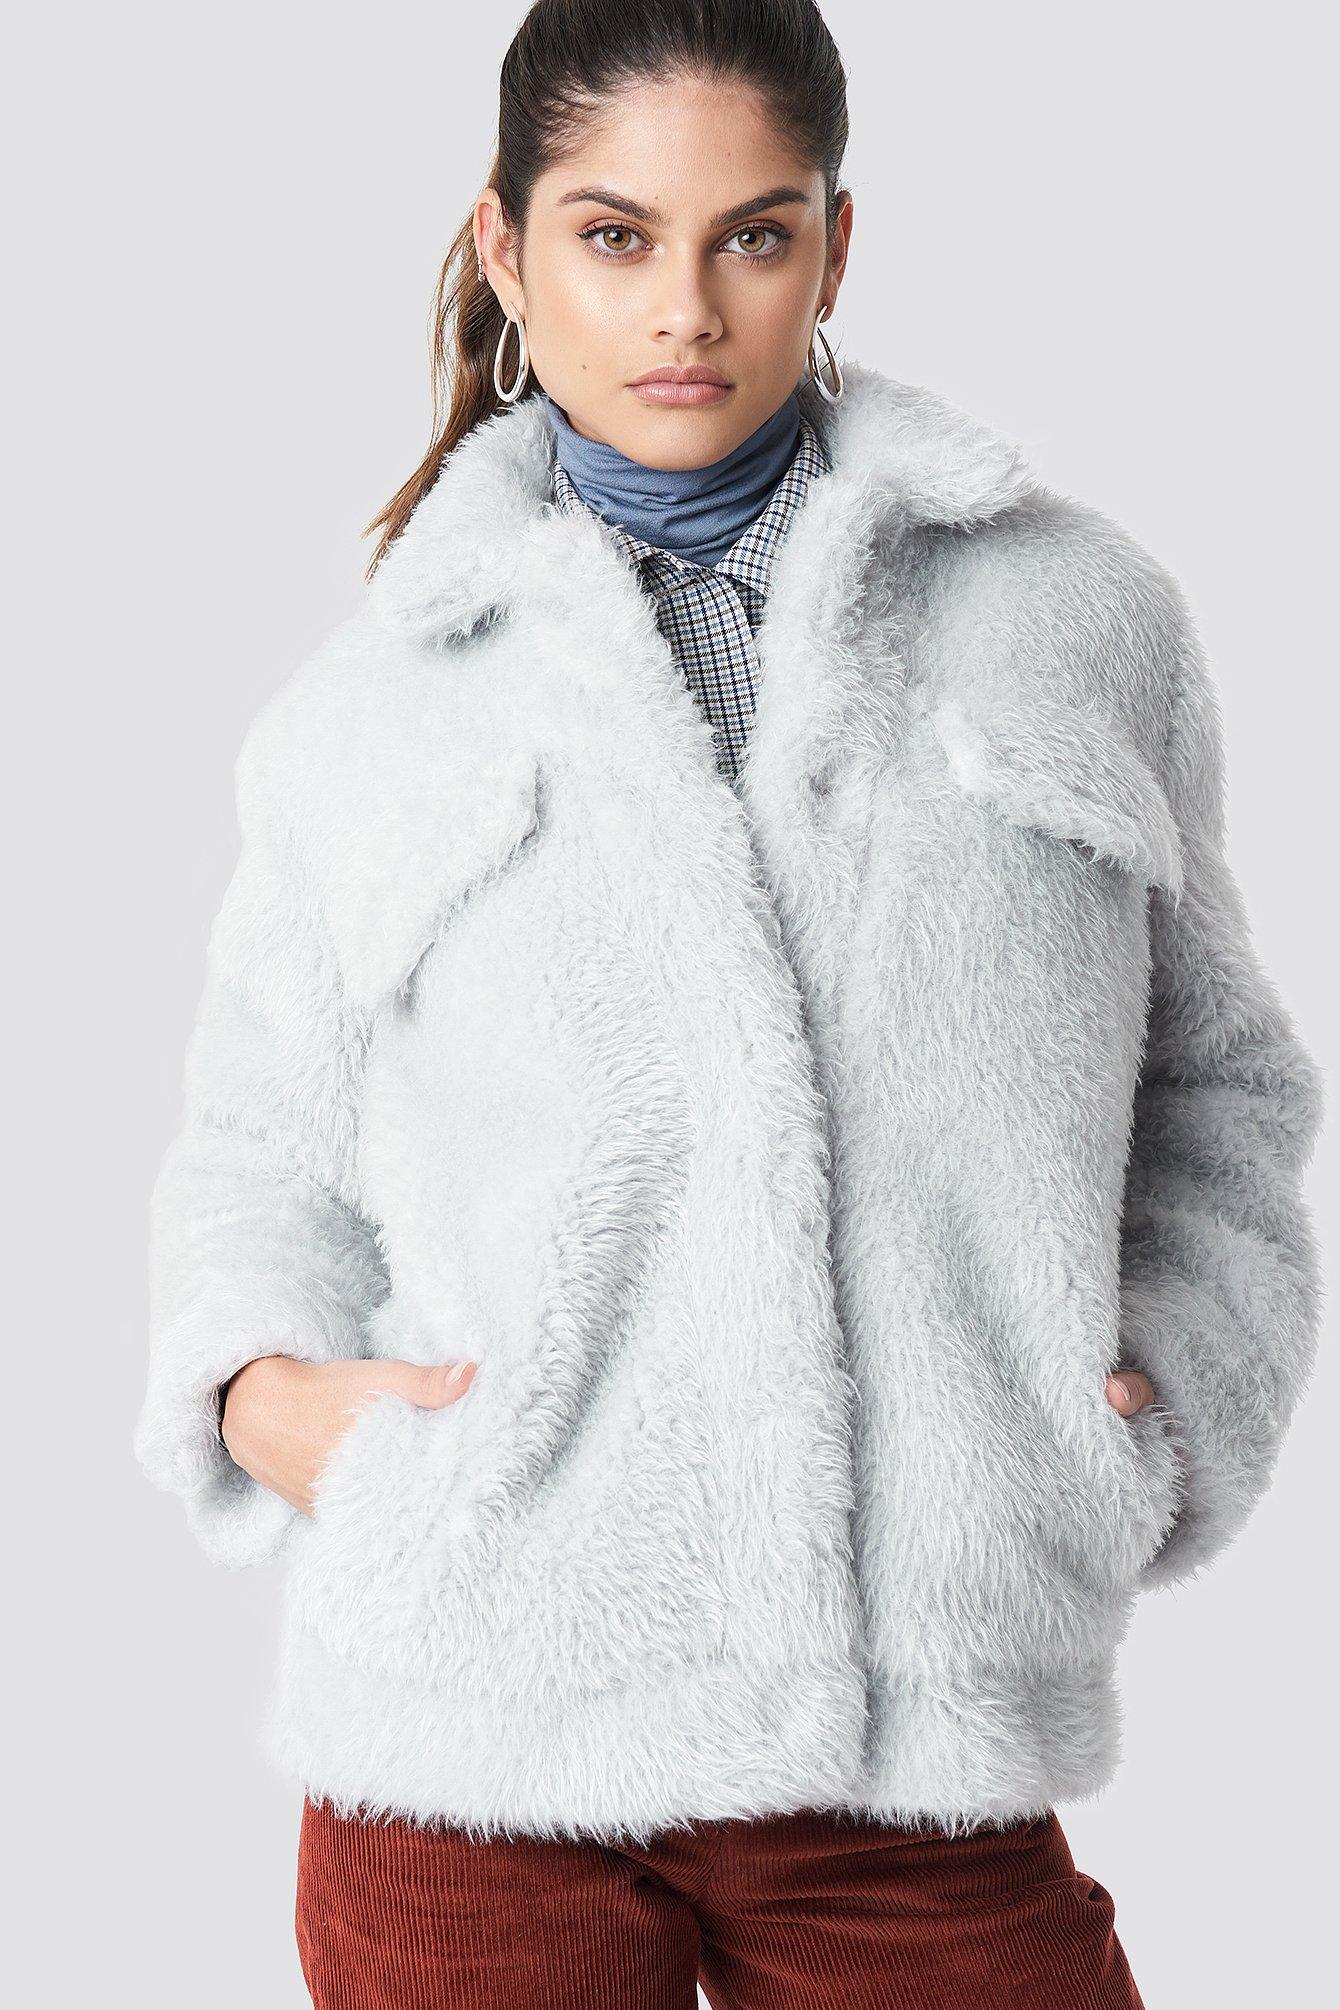 samsoe & samsoe -  Colbie Jacket 10430 - Blue